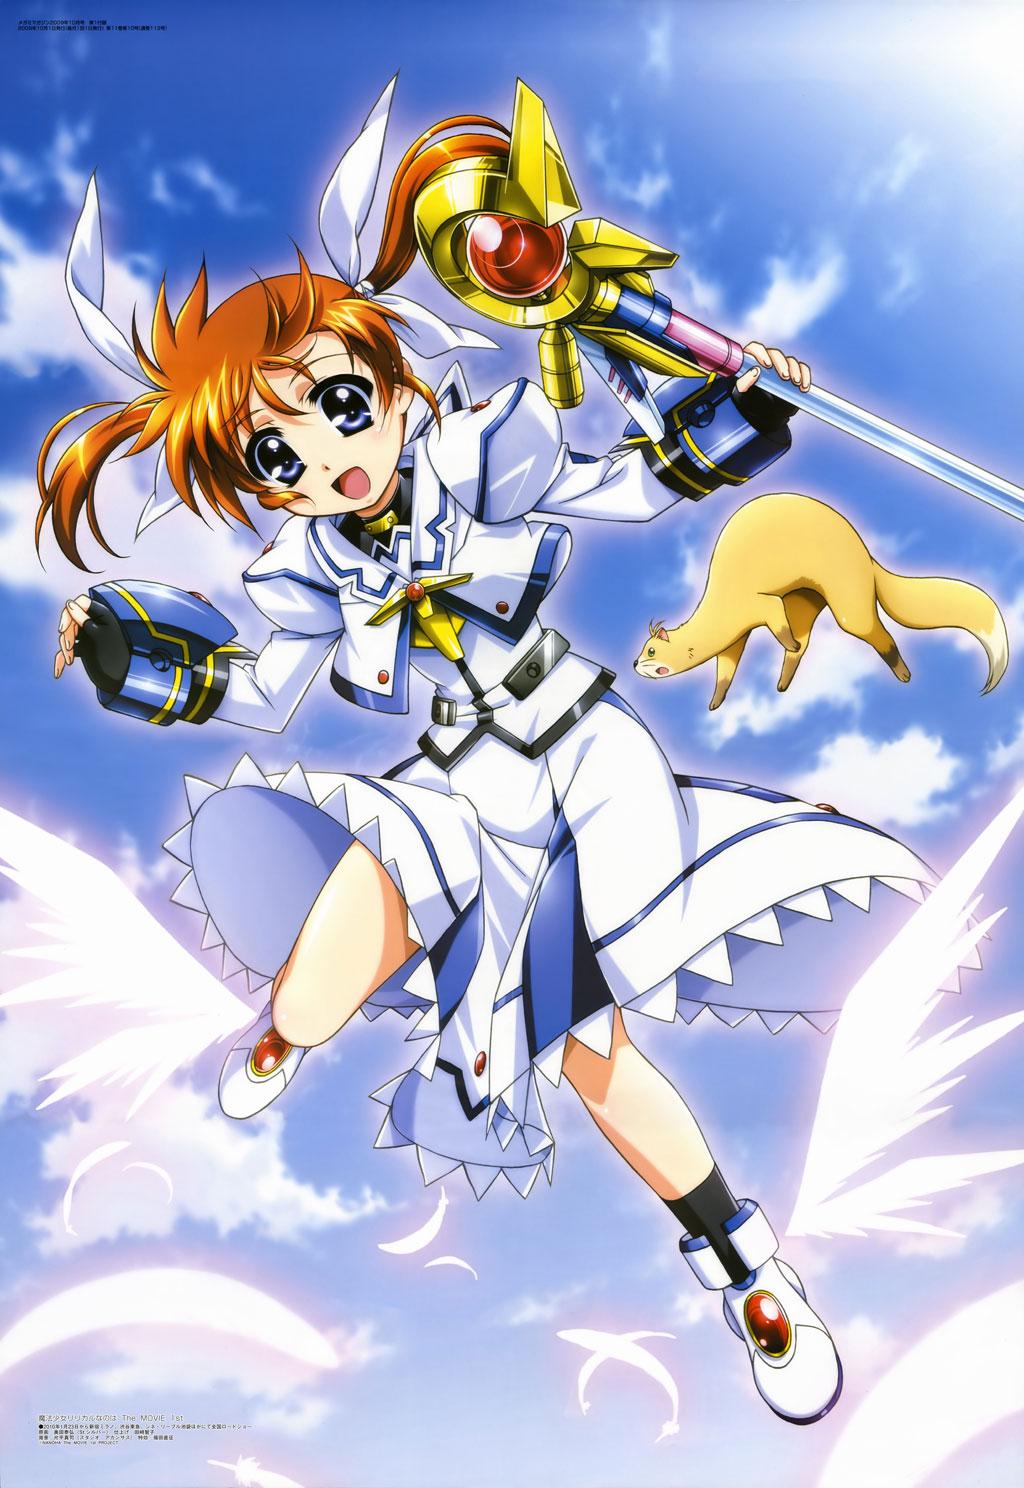 Alter Lyrical Nanoha The Movie 1st Nanoha Takamachi